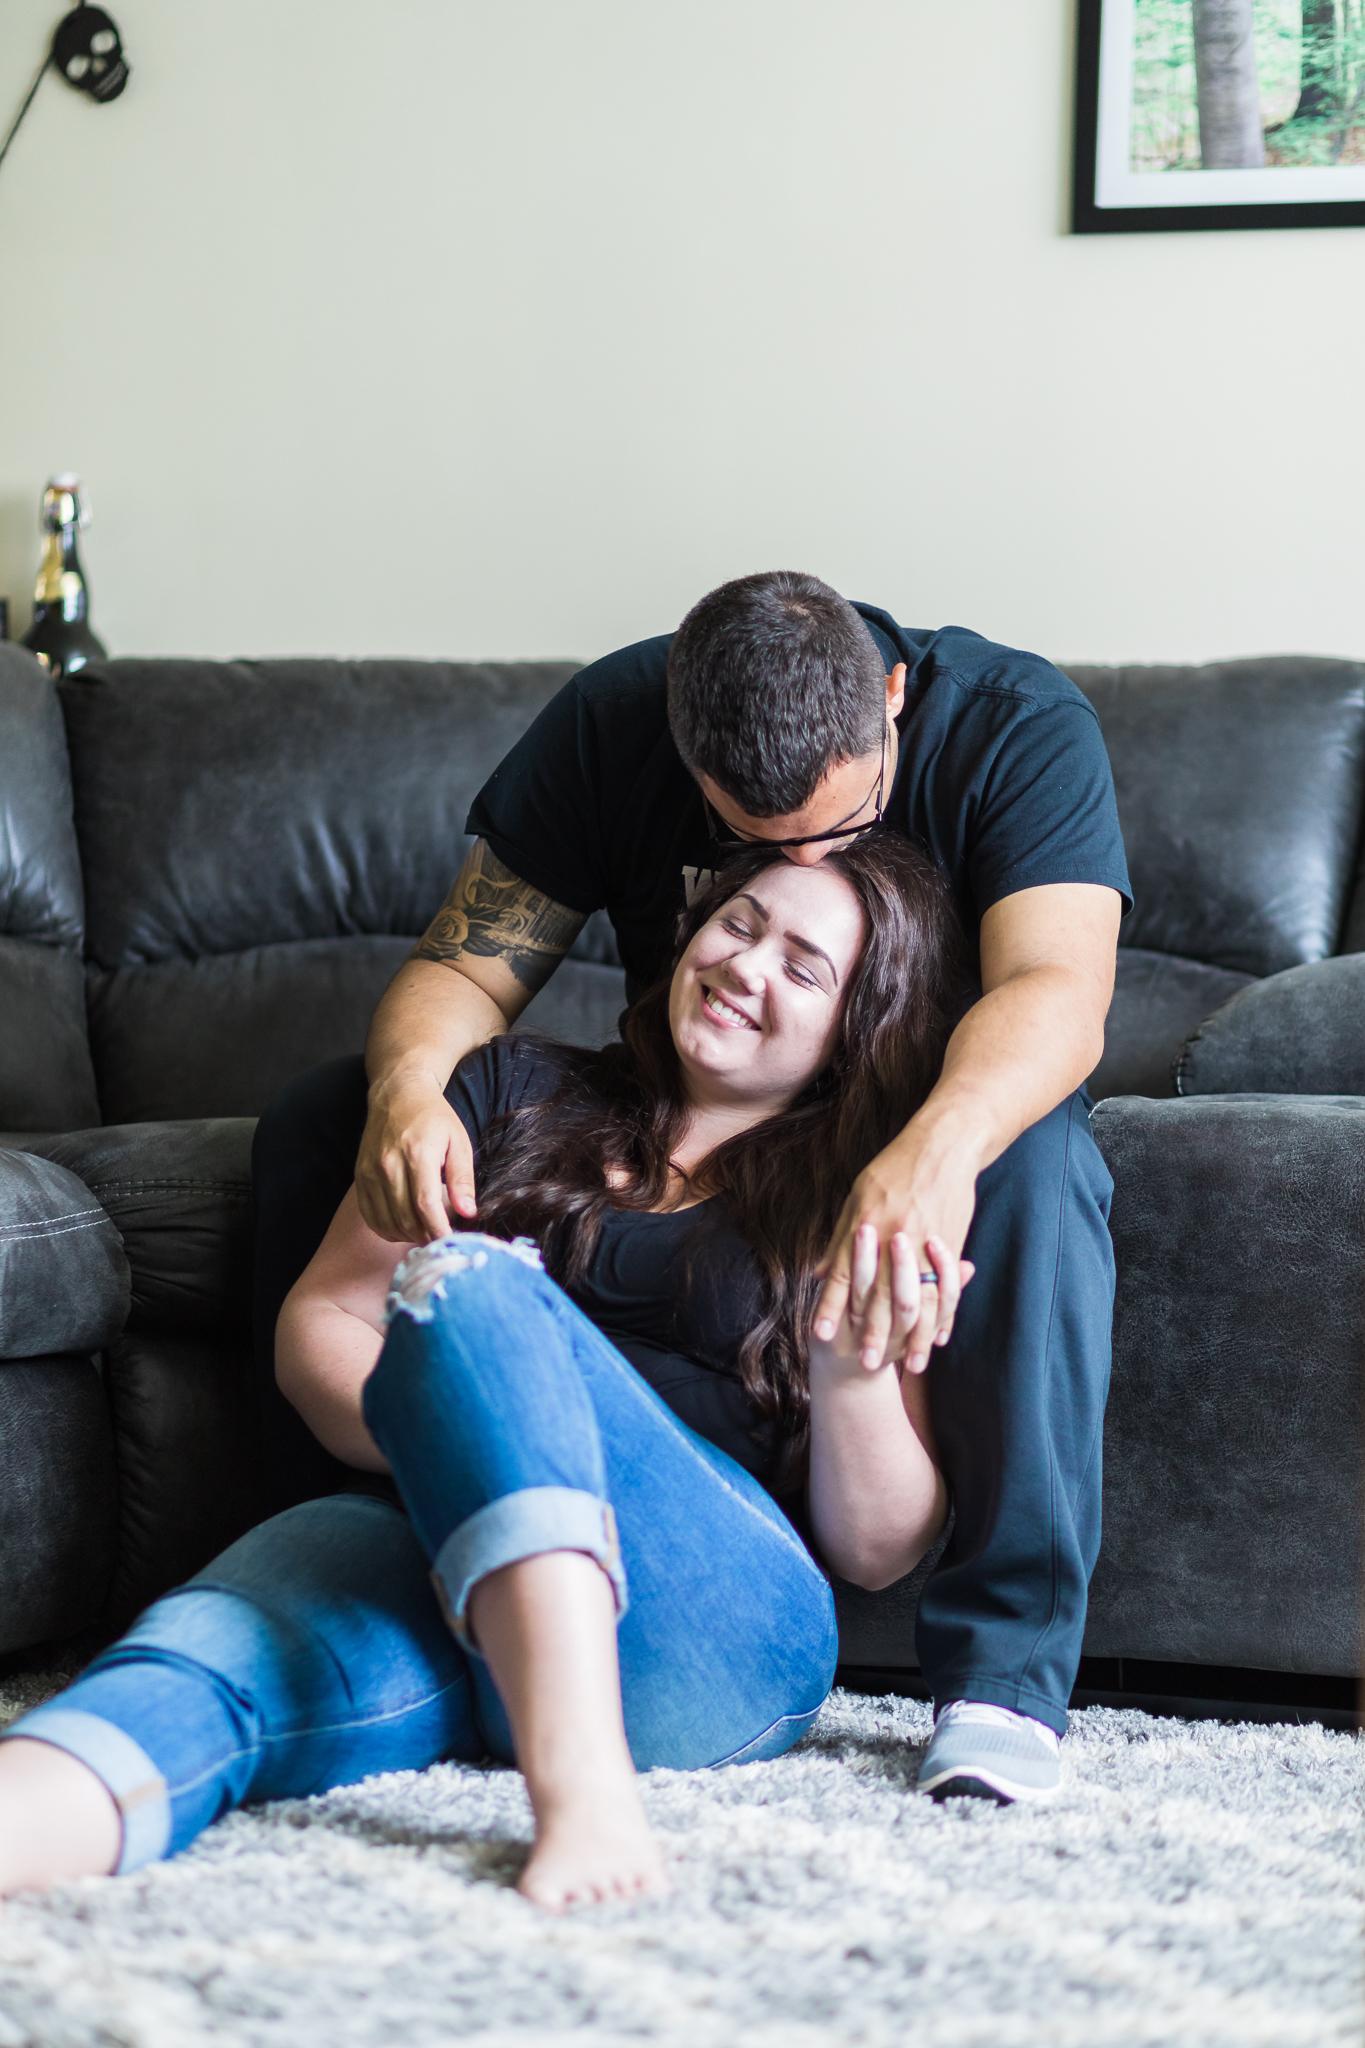 Geringer Couples Lifestyle-11.jpg